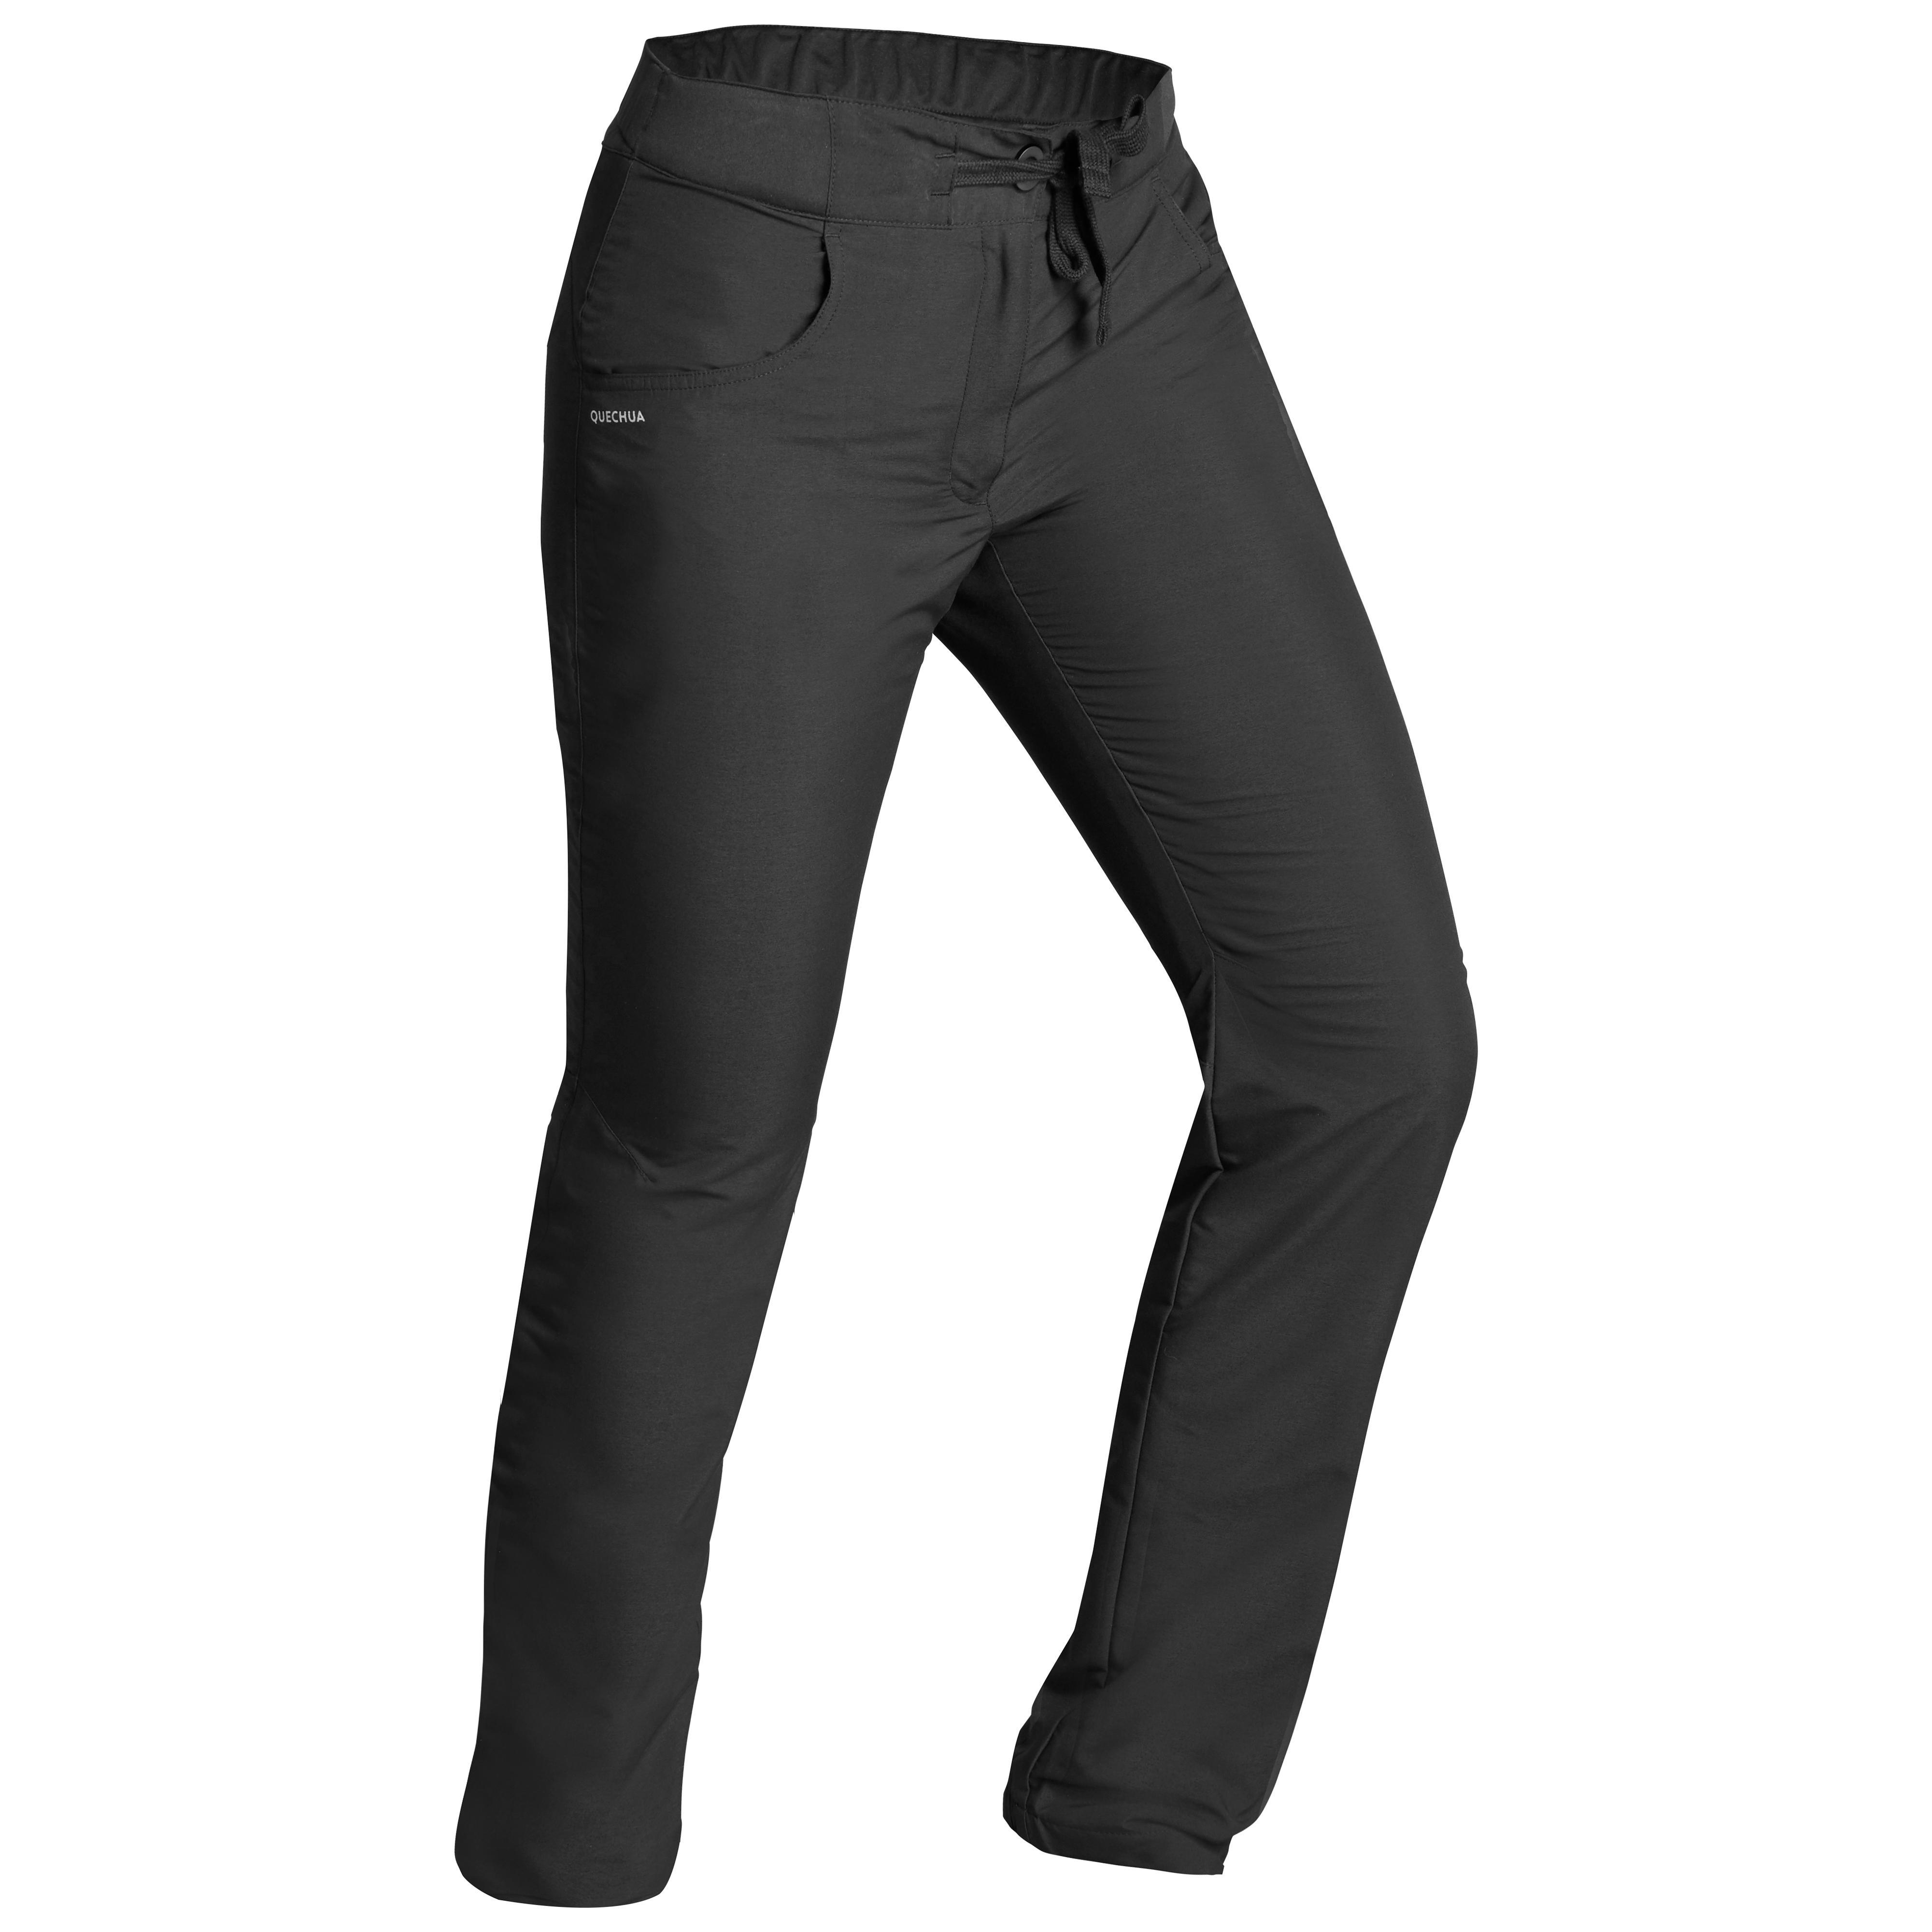 Pantalon SH100 ULTRA-WARM Damă imagine produs